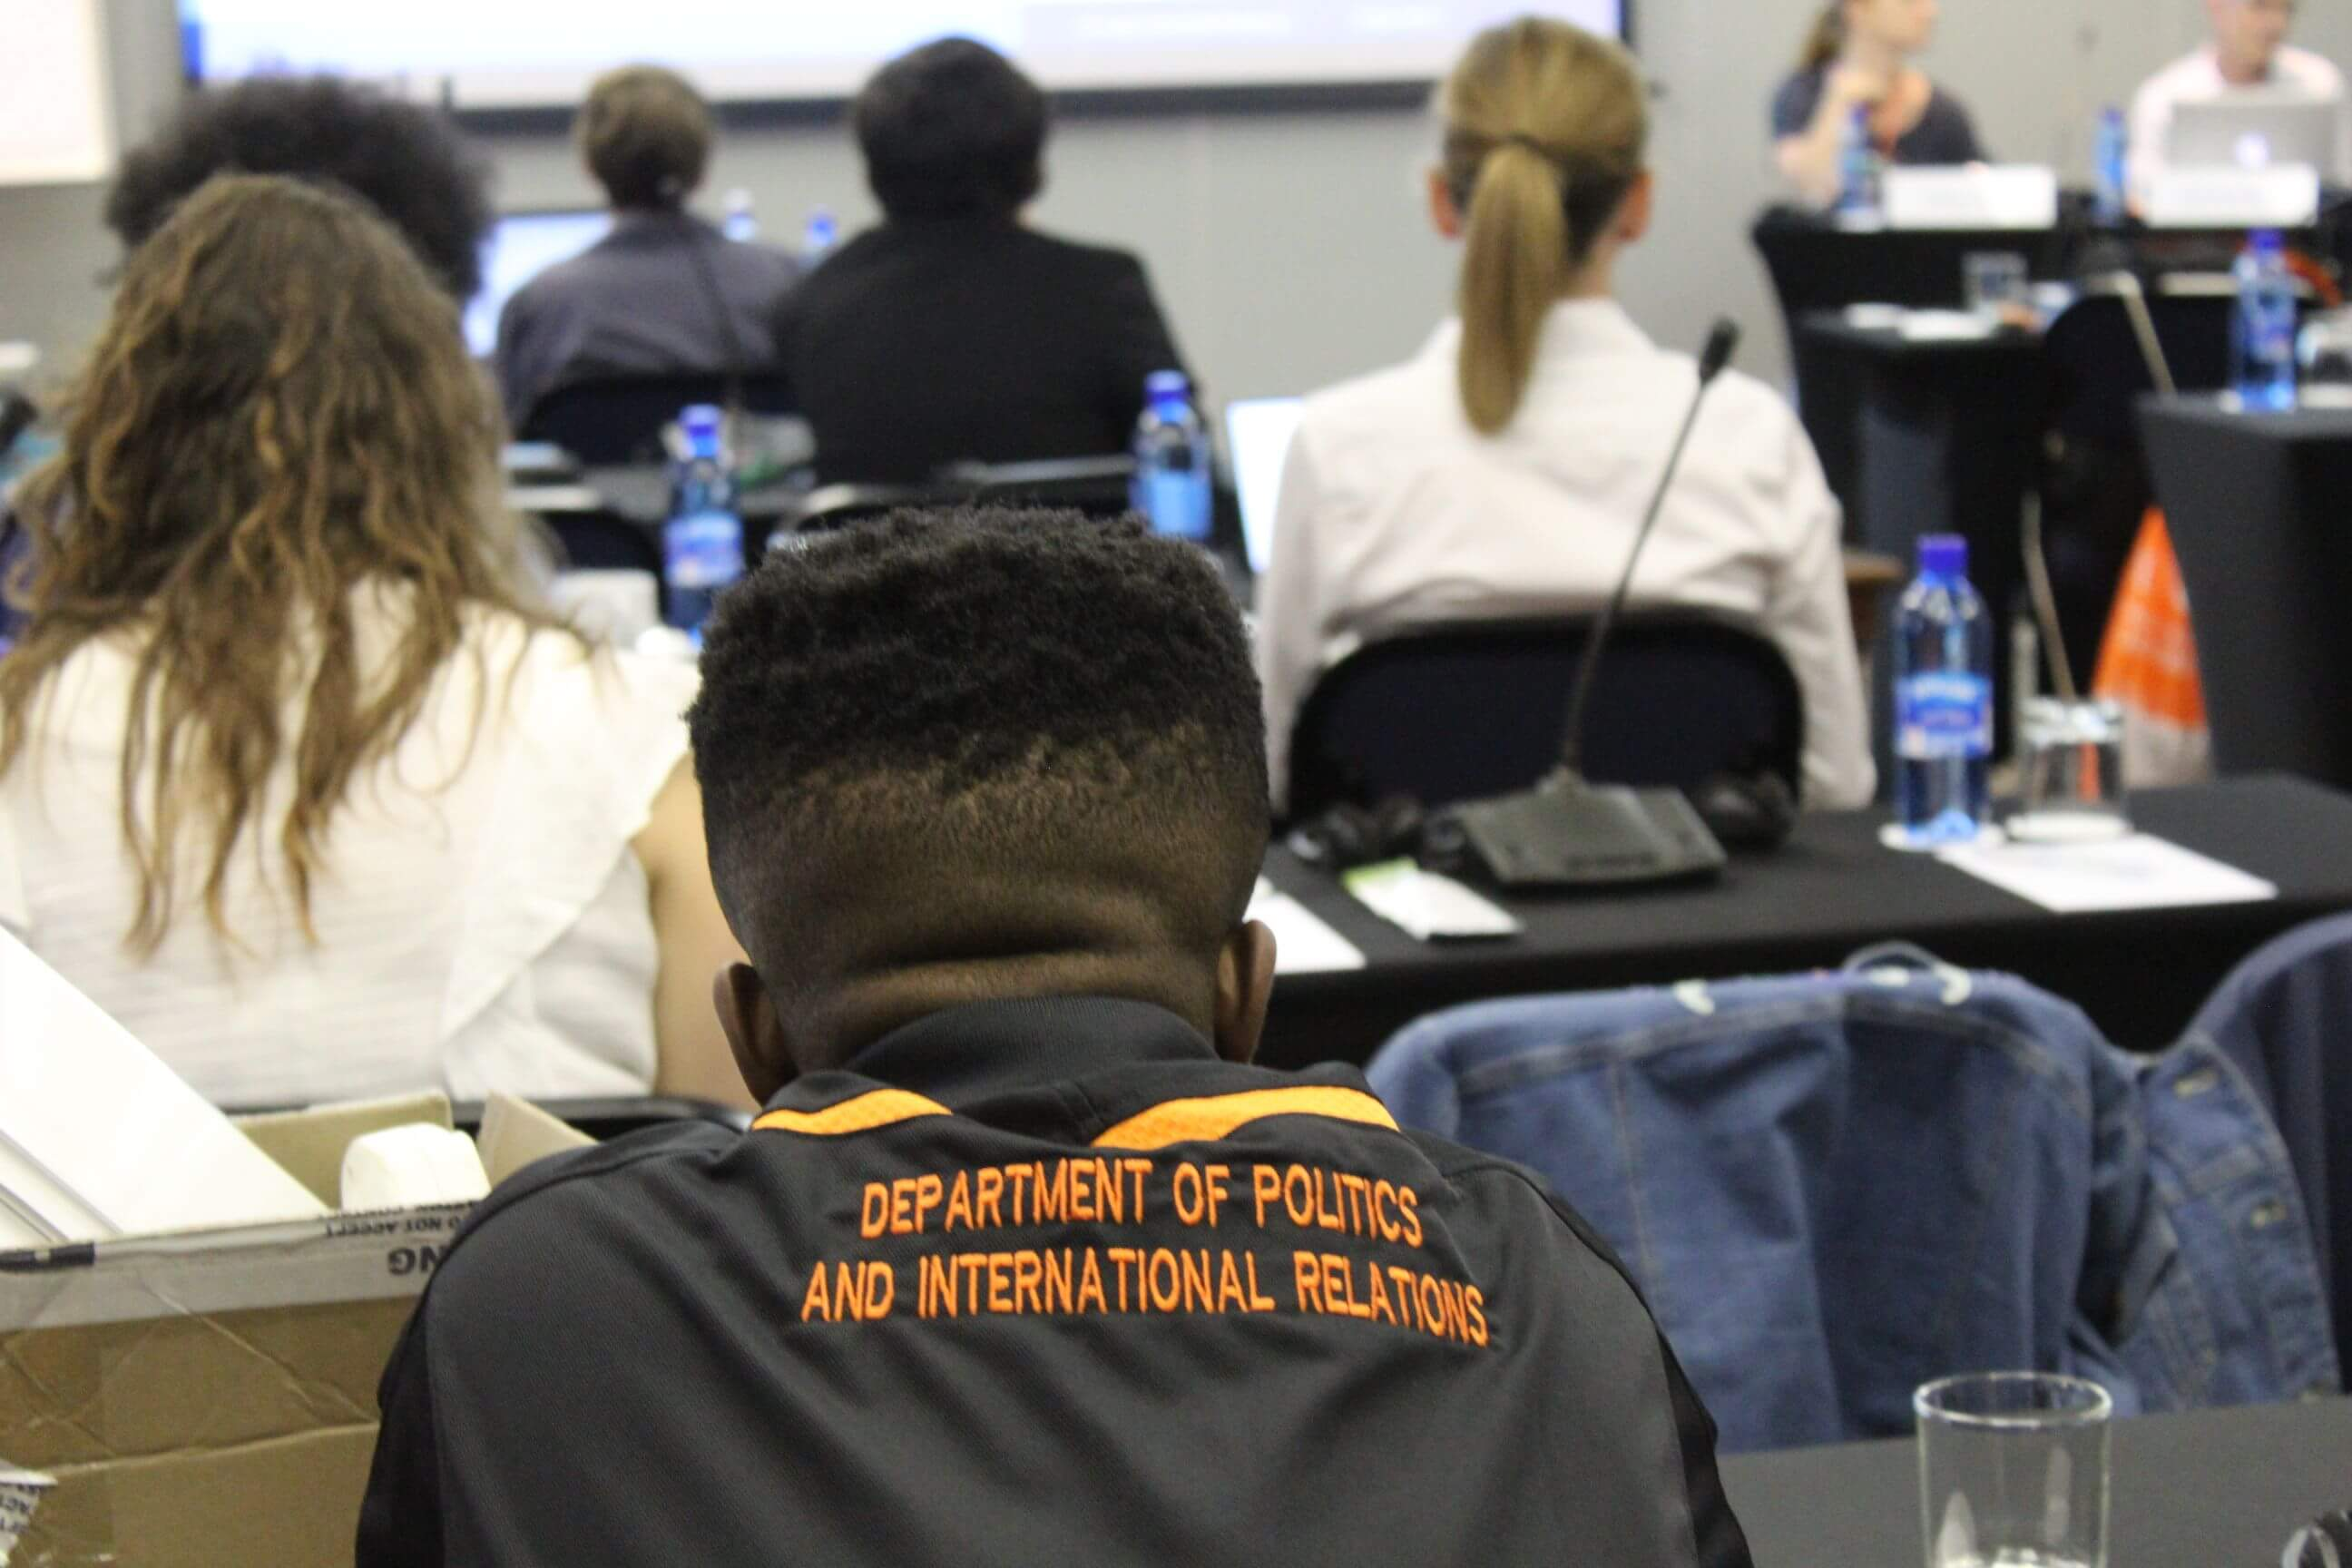 University of Johannesburg: Empowering tomorrow's changemakers